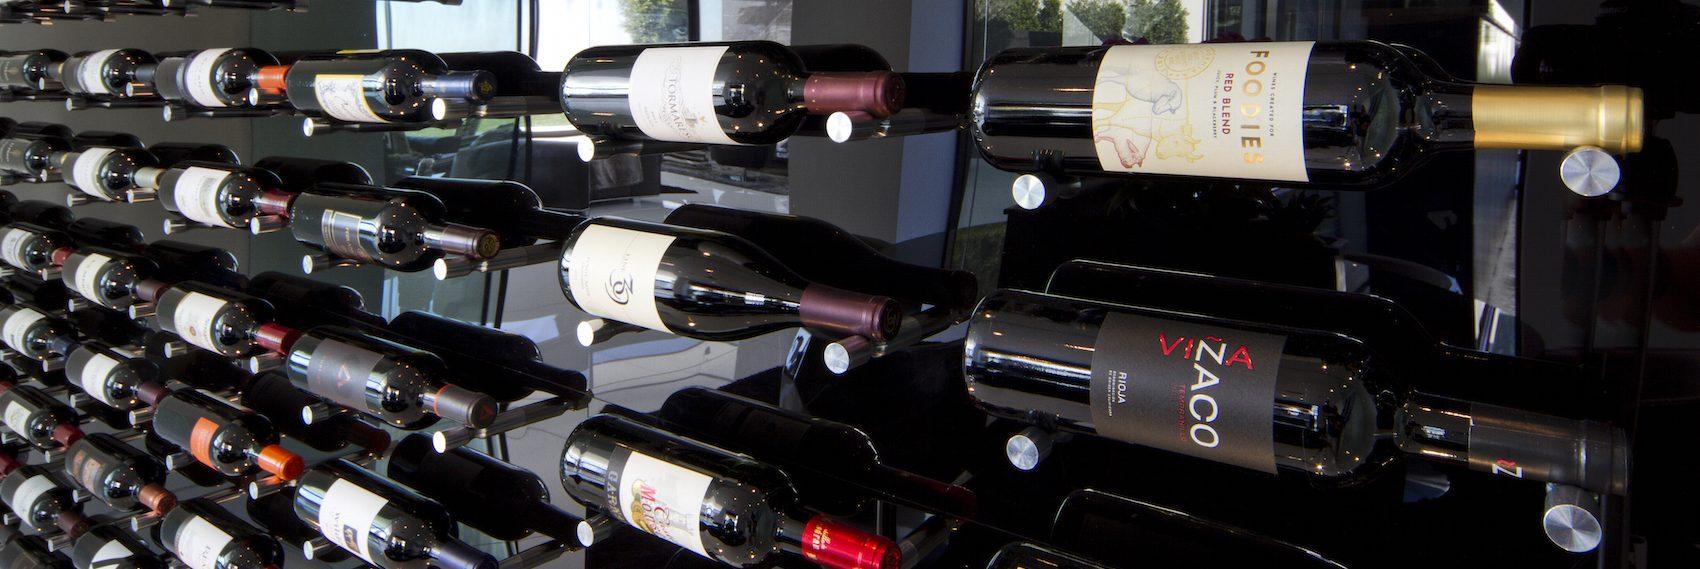 wine rack top e1613188685500